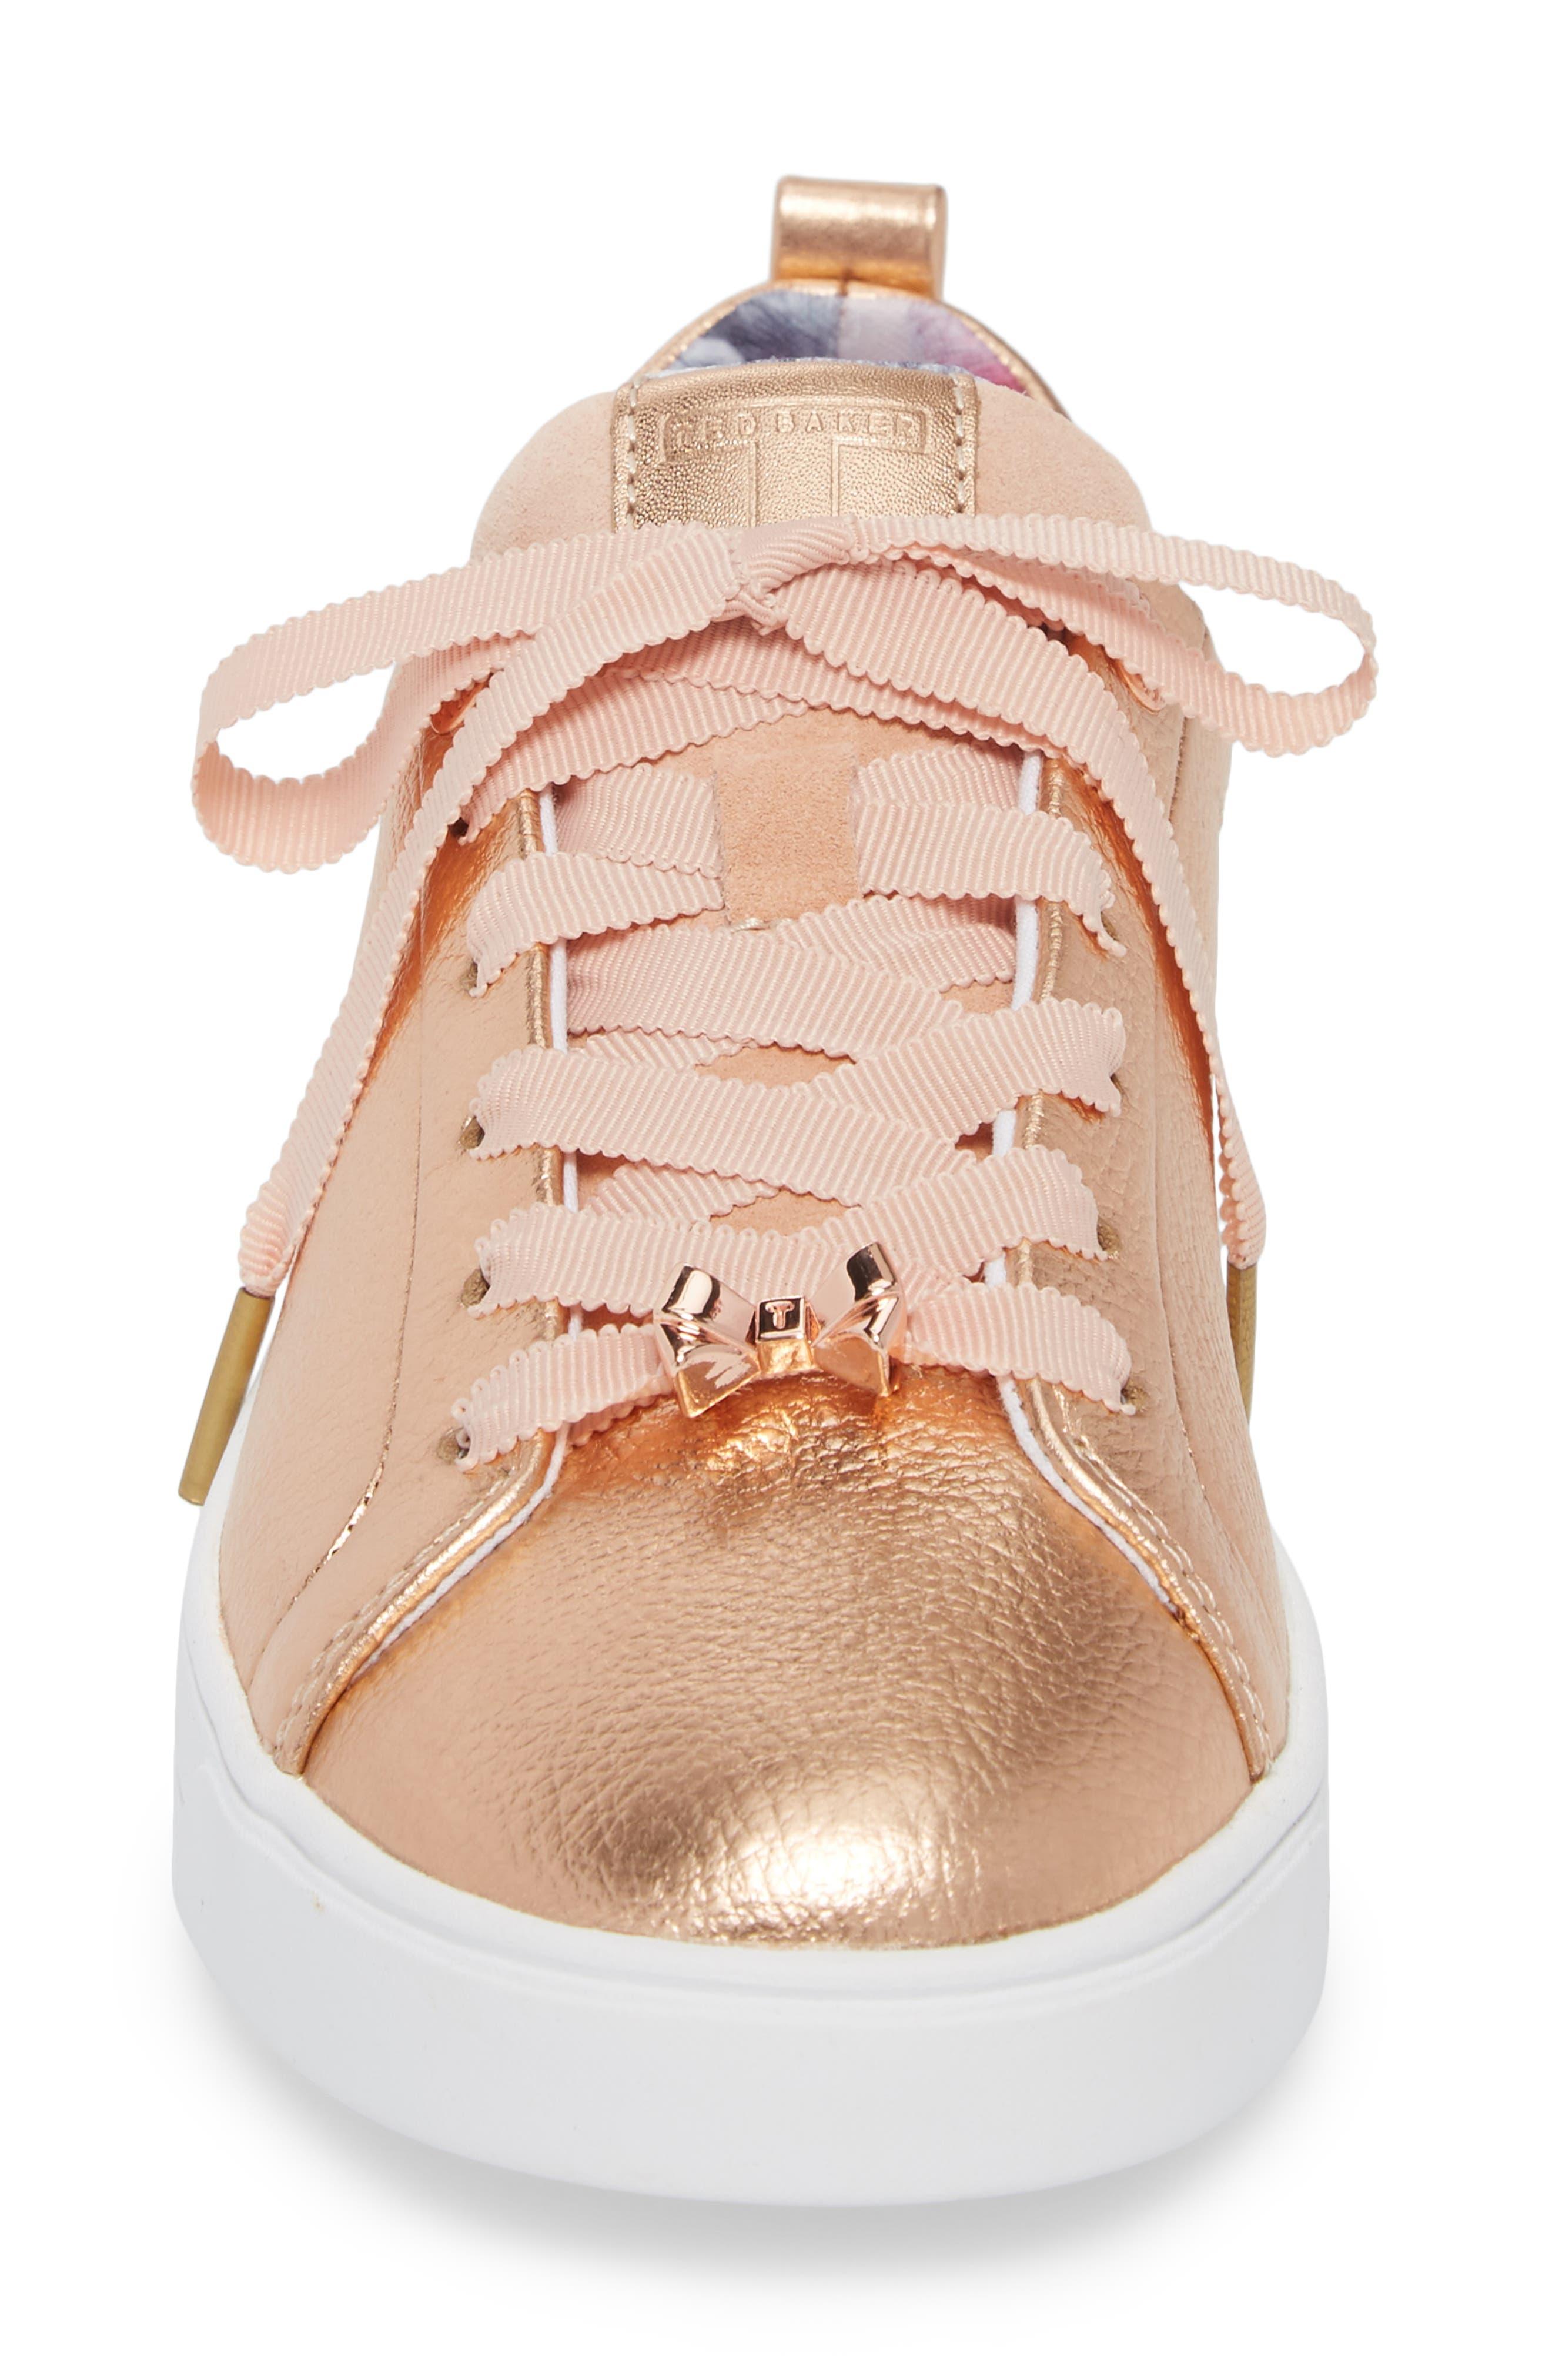 Kelleip Sneaker,                             Alternate thumbnail 4, color,                             ROSE GOLD/ PALACE GARDENS